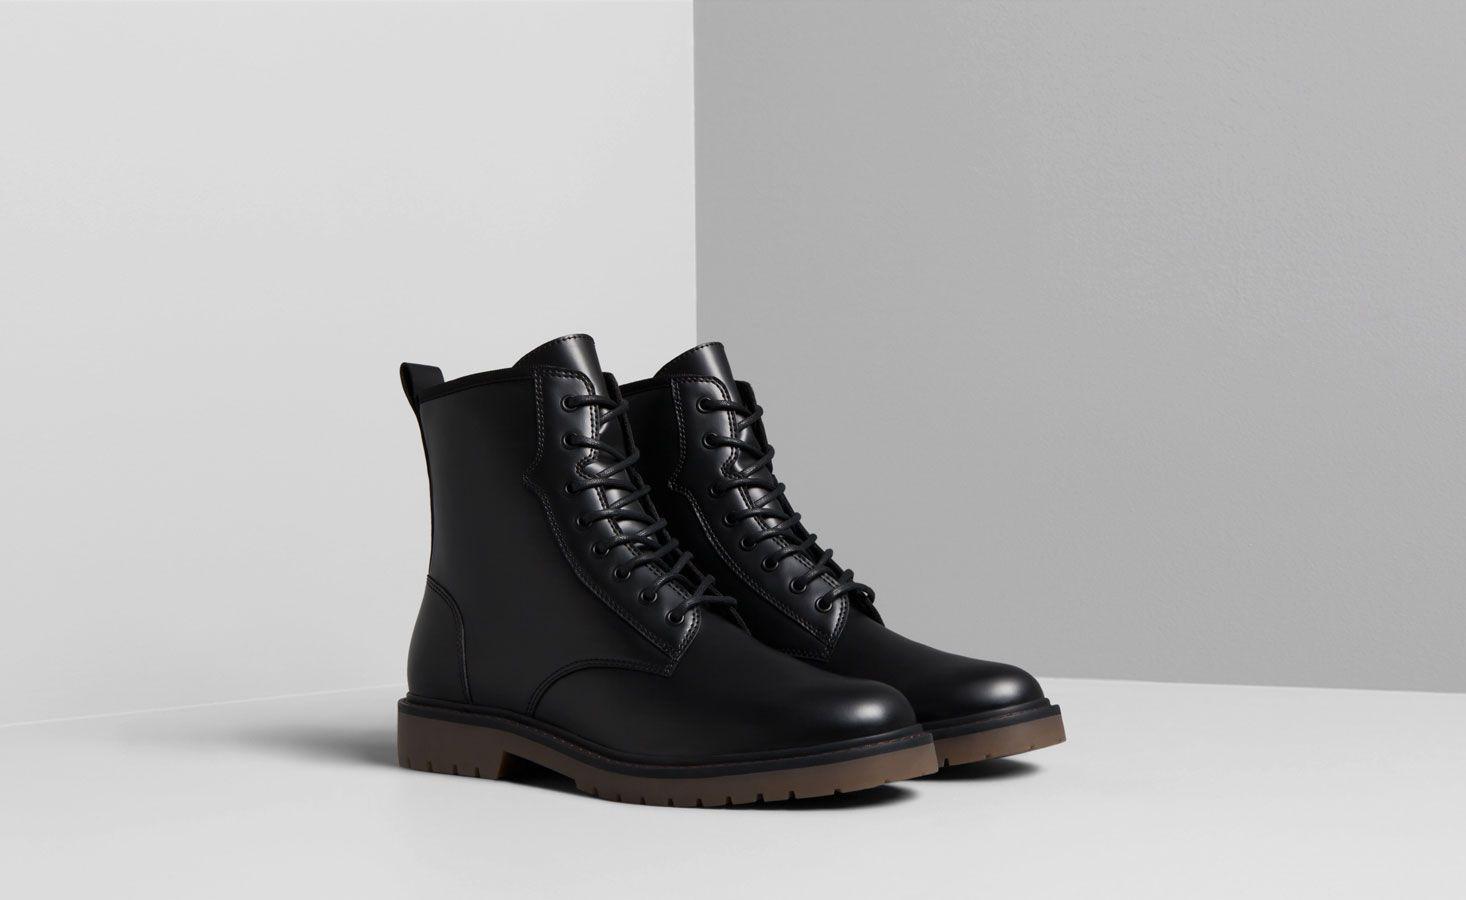 Zapatos Hombre Hombre Pull Bear Colombia Zapatos Hombre Botas Hombre Negras Calzado Hombre